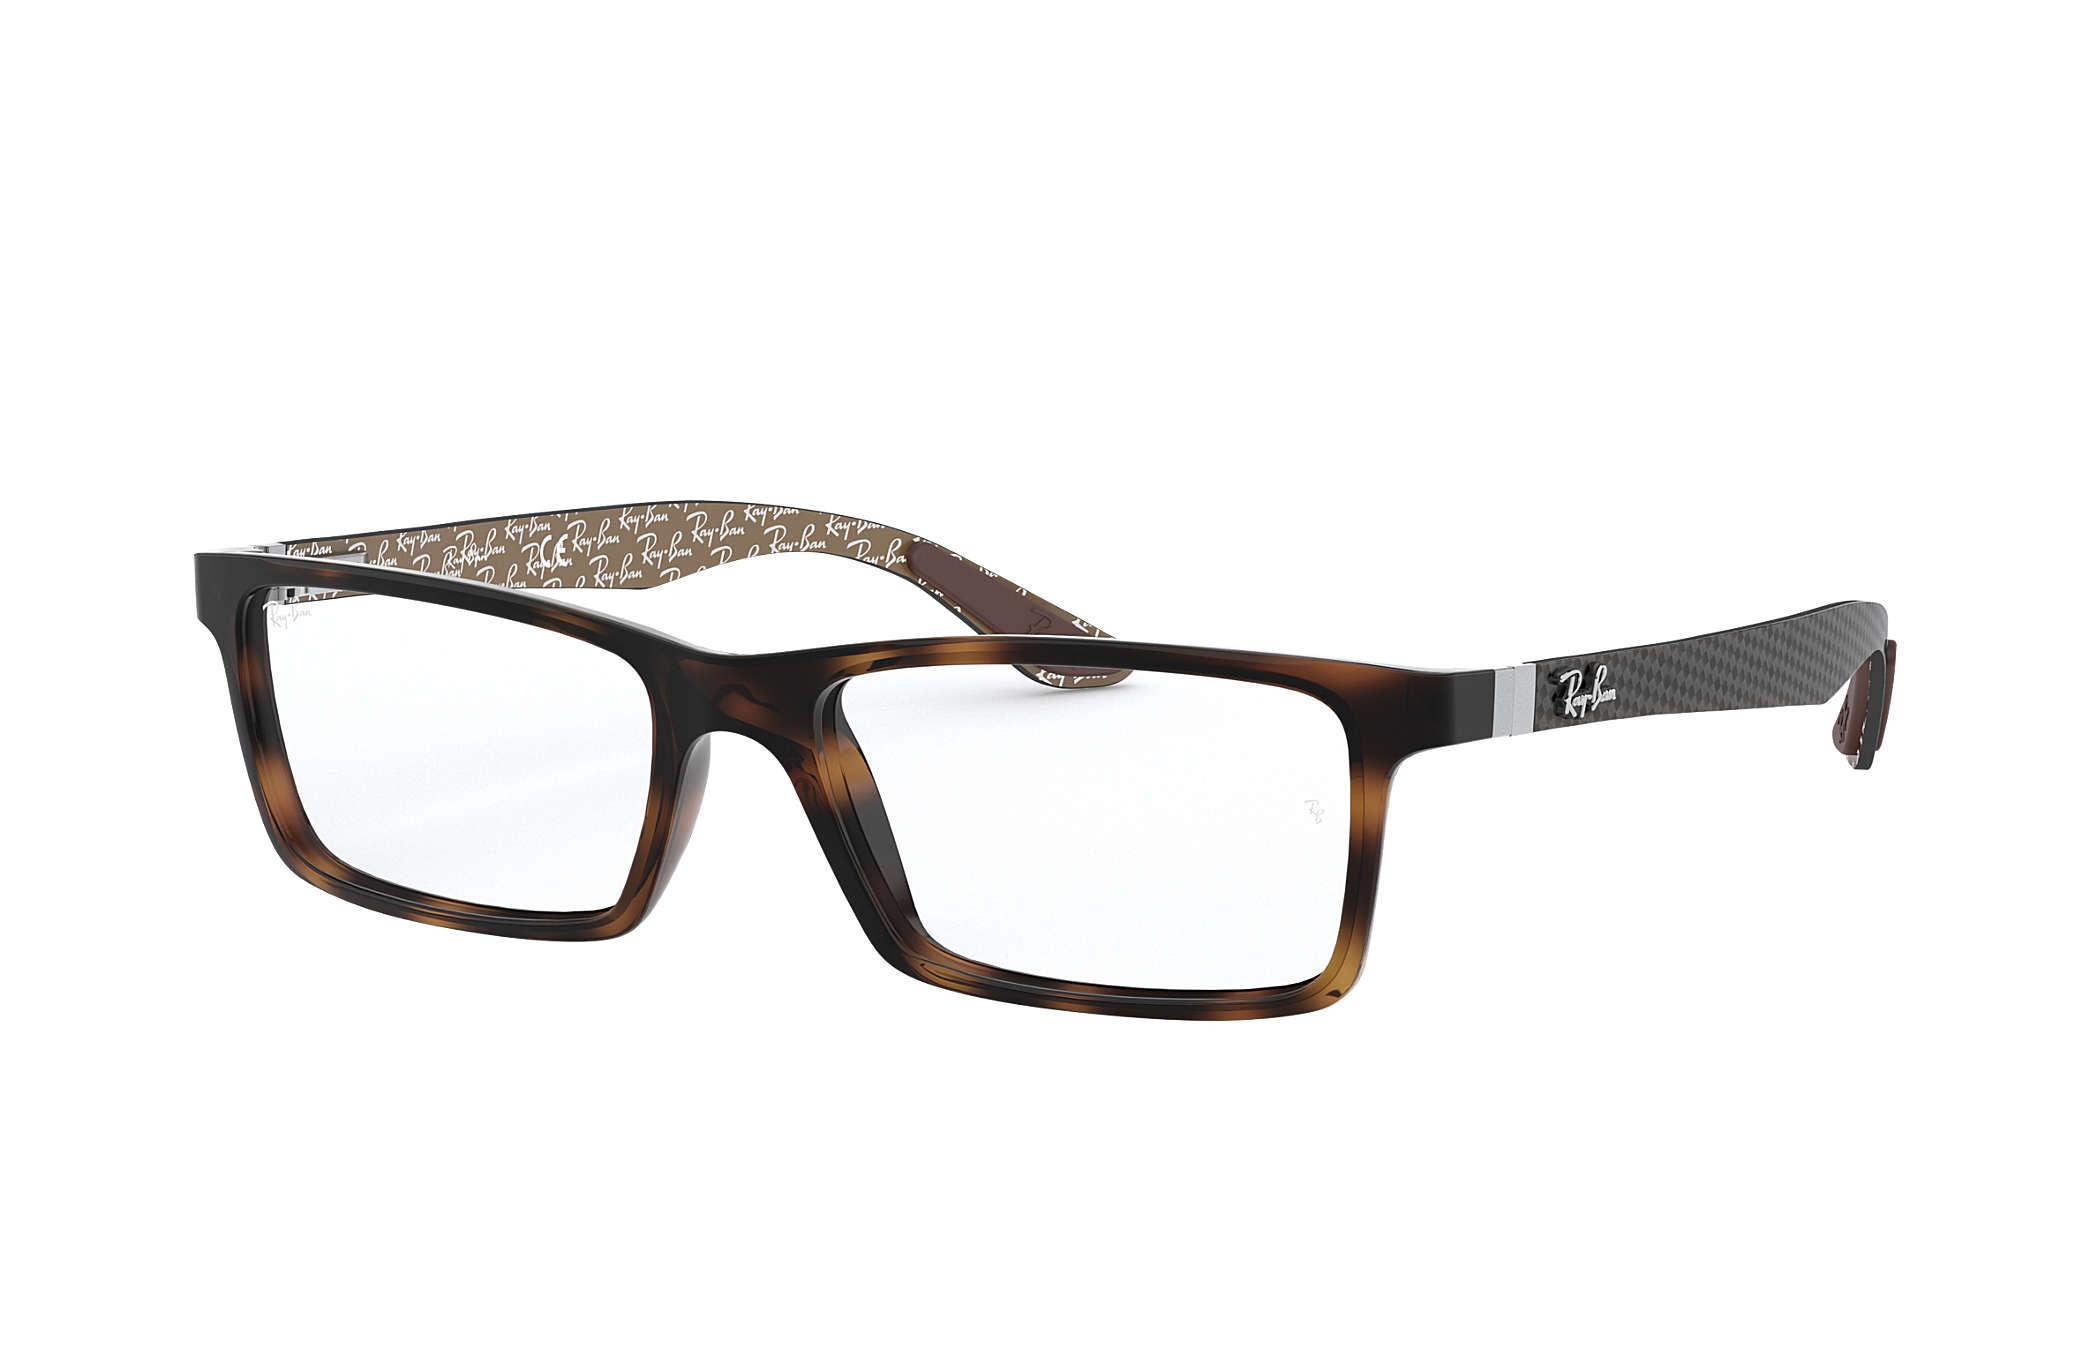 3406cf57f1e5b Ray-Ban prescription glasses RB8901 Tortoise - Injected ...